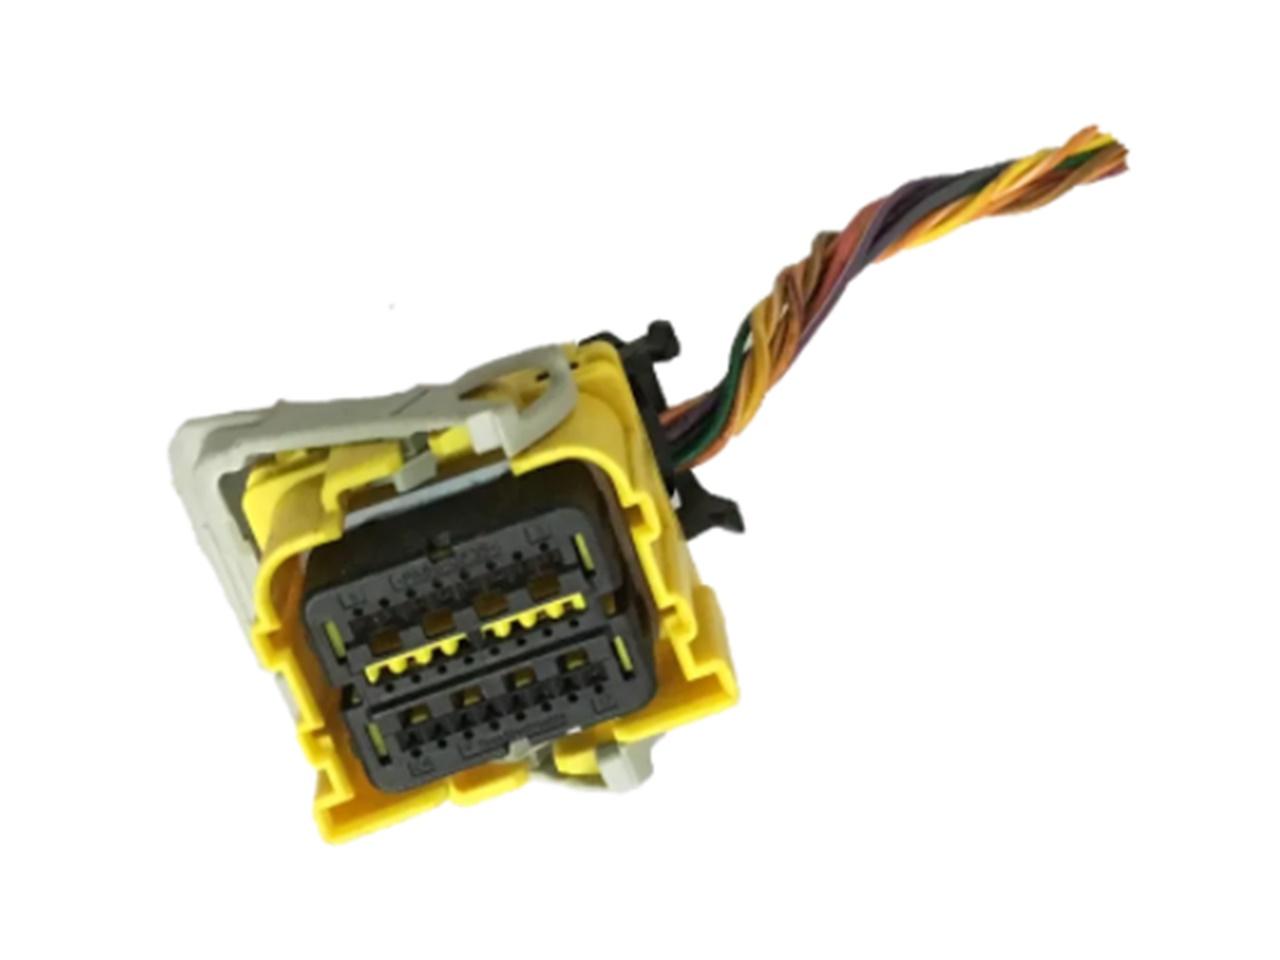 Plug Conector Chicote Menor do Módulo de Air bag 13583413 23116541 13587666 13589686 22922715 13585613 13595559 13514454 Prisma Spin Onix Sonic Cruze 011 012 013 014 015 016 017 018 019